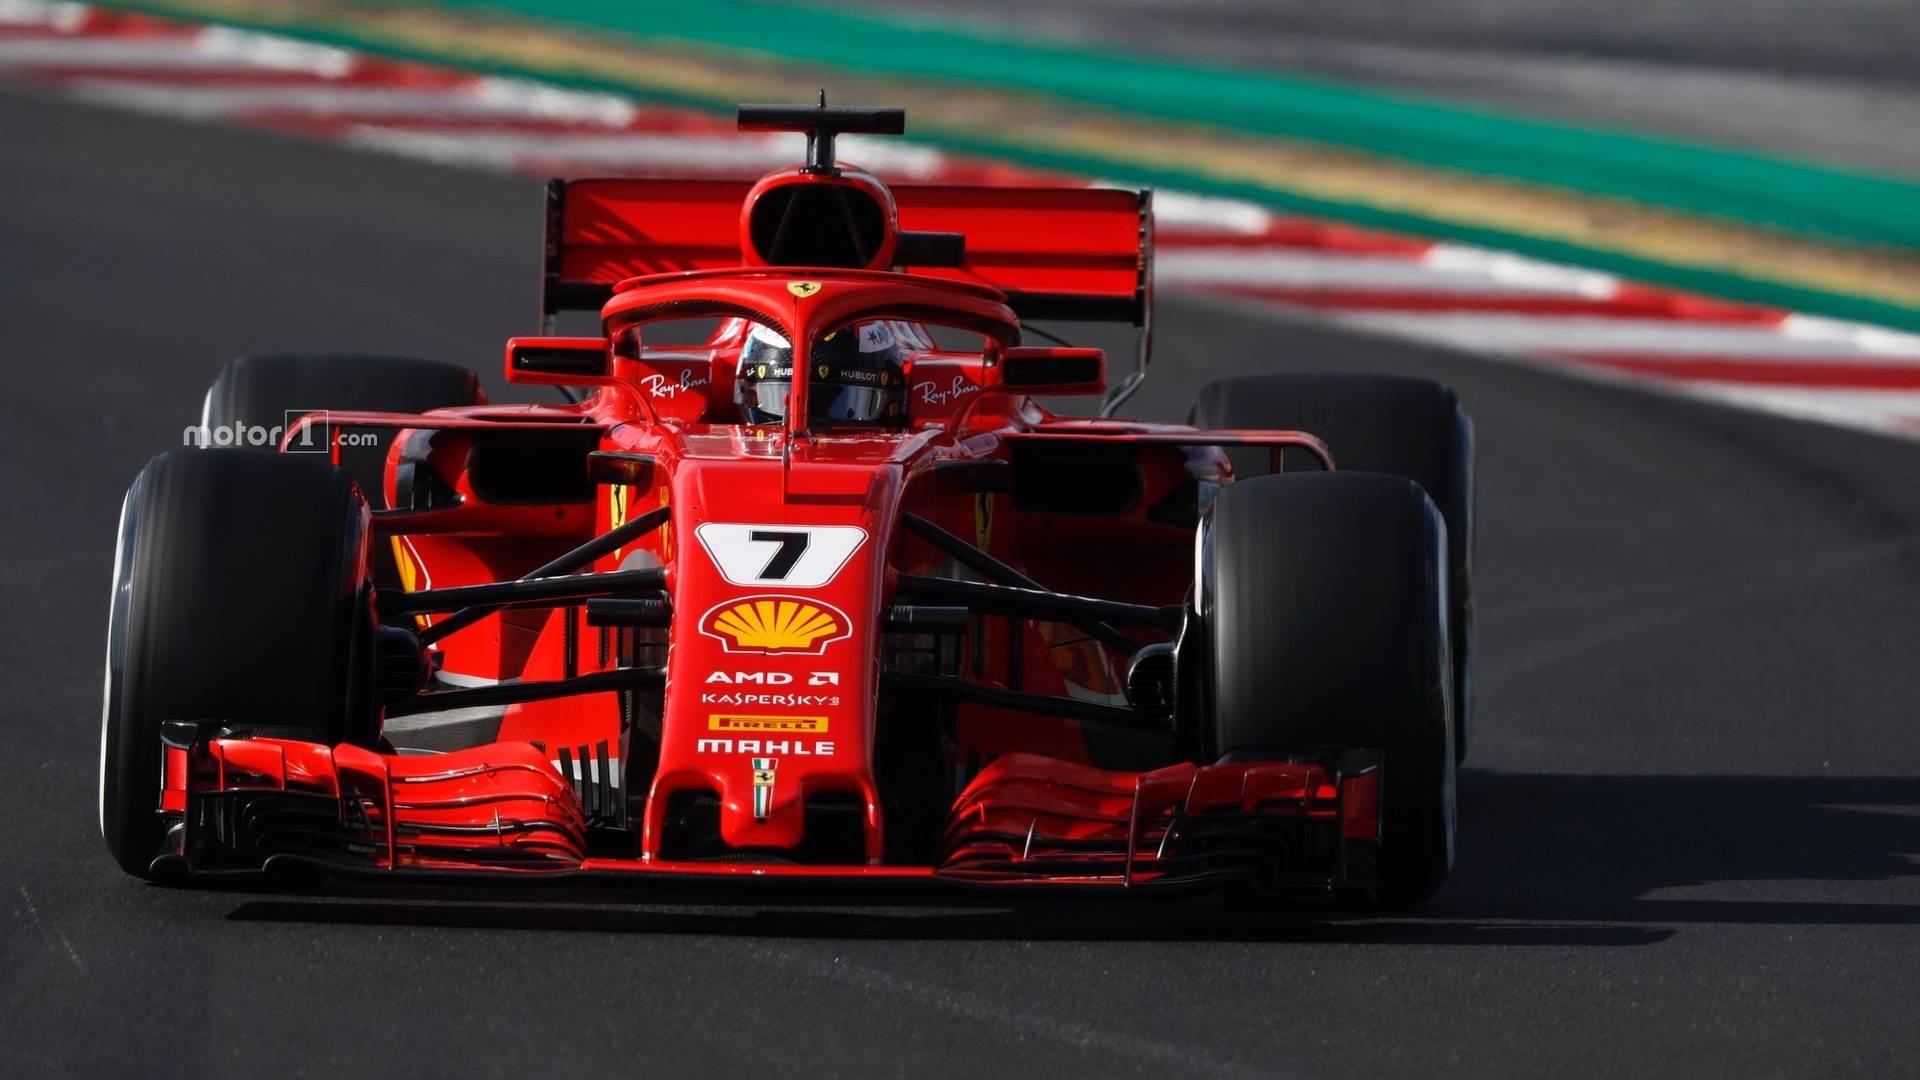 Ferrari Is Getting Ready To Ditch Kimi Raikkonen For Next Year